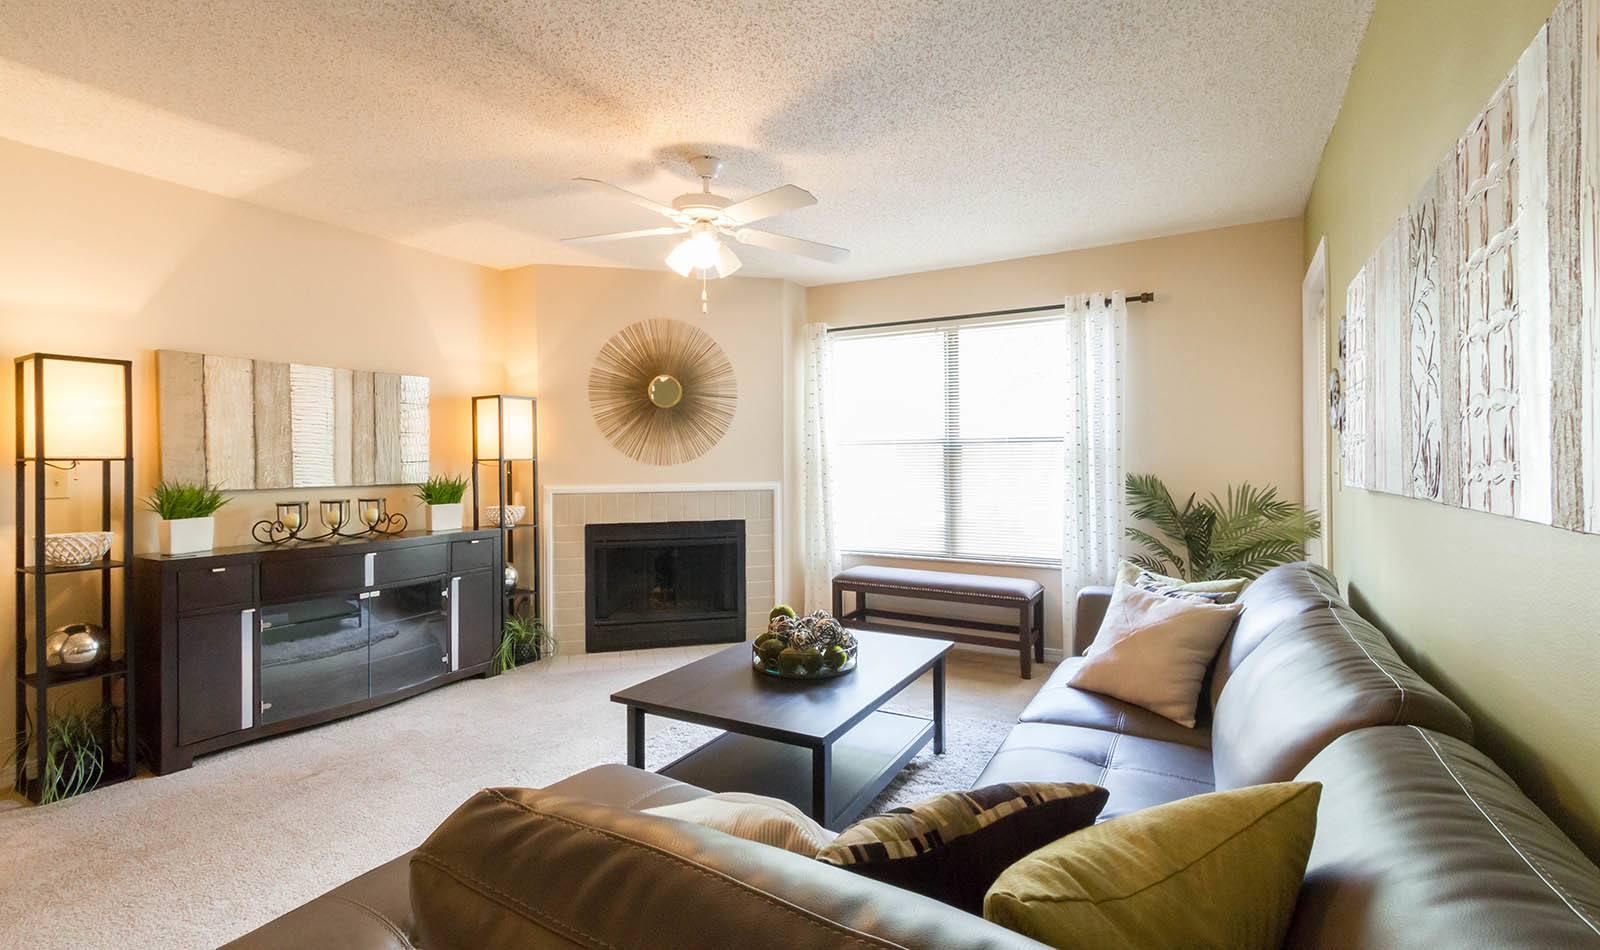 Living room at Vista Grande in Orange Park, FL